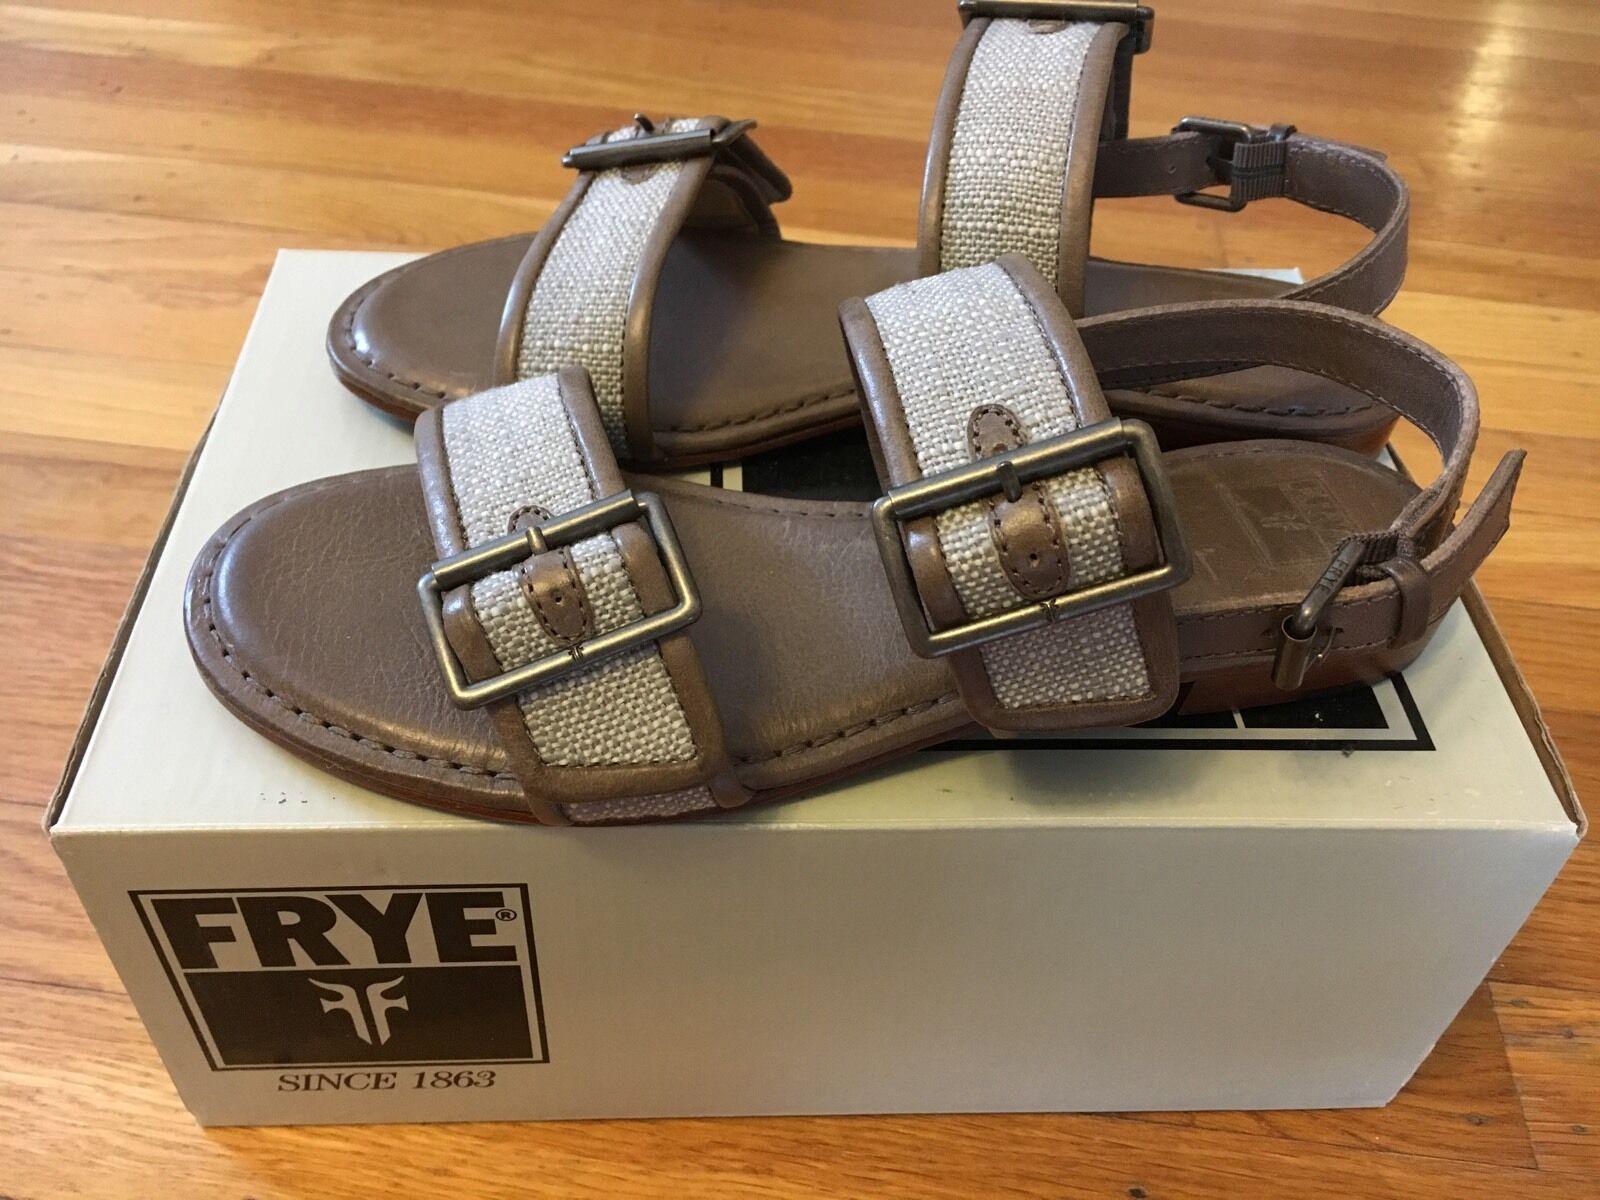 Soludos Women's Ghillie Platform Espadrille Sandal Dove Gray Leather MM1 Size 7